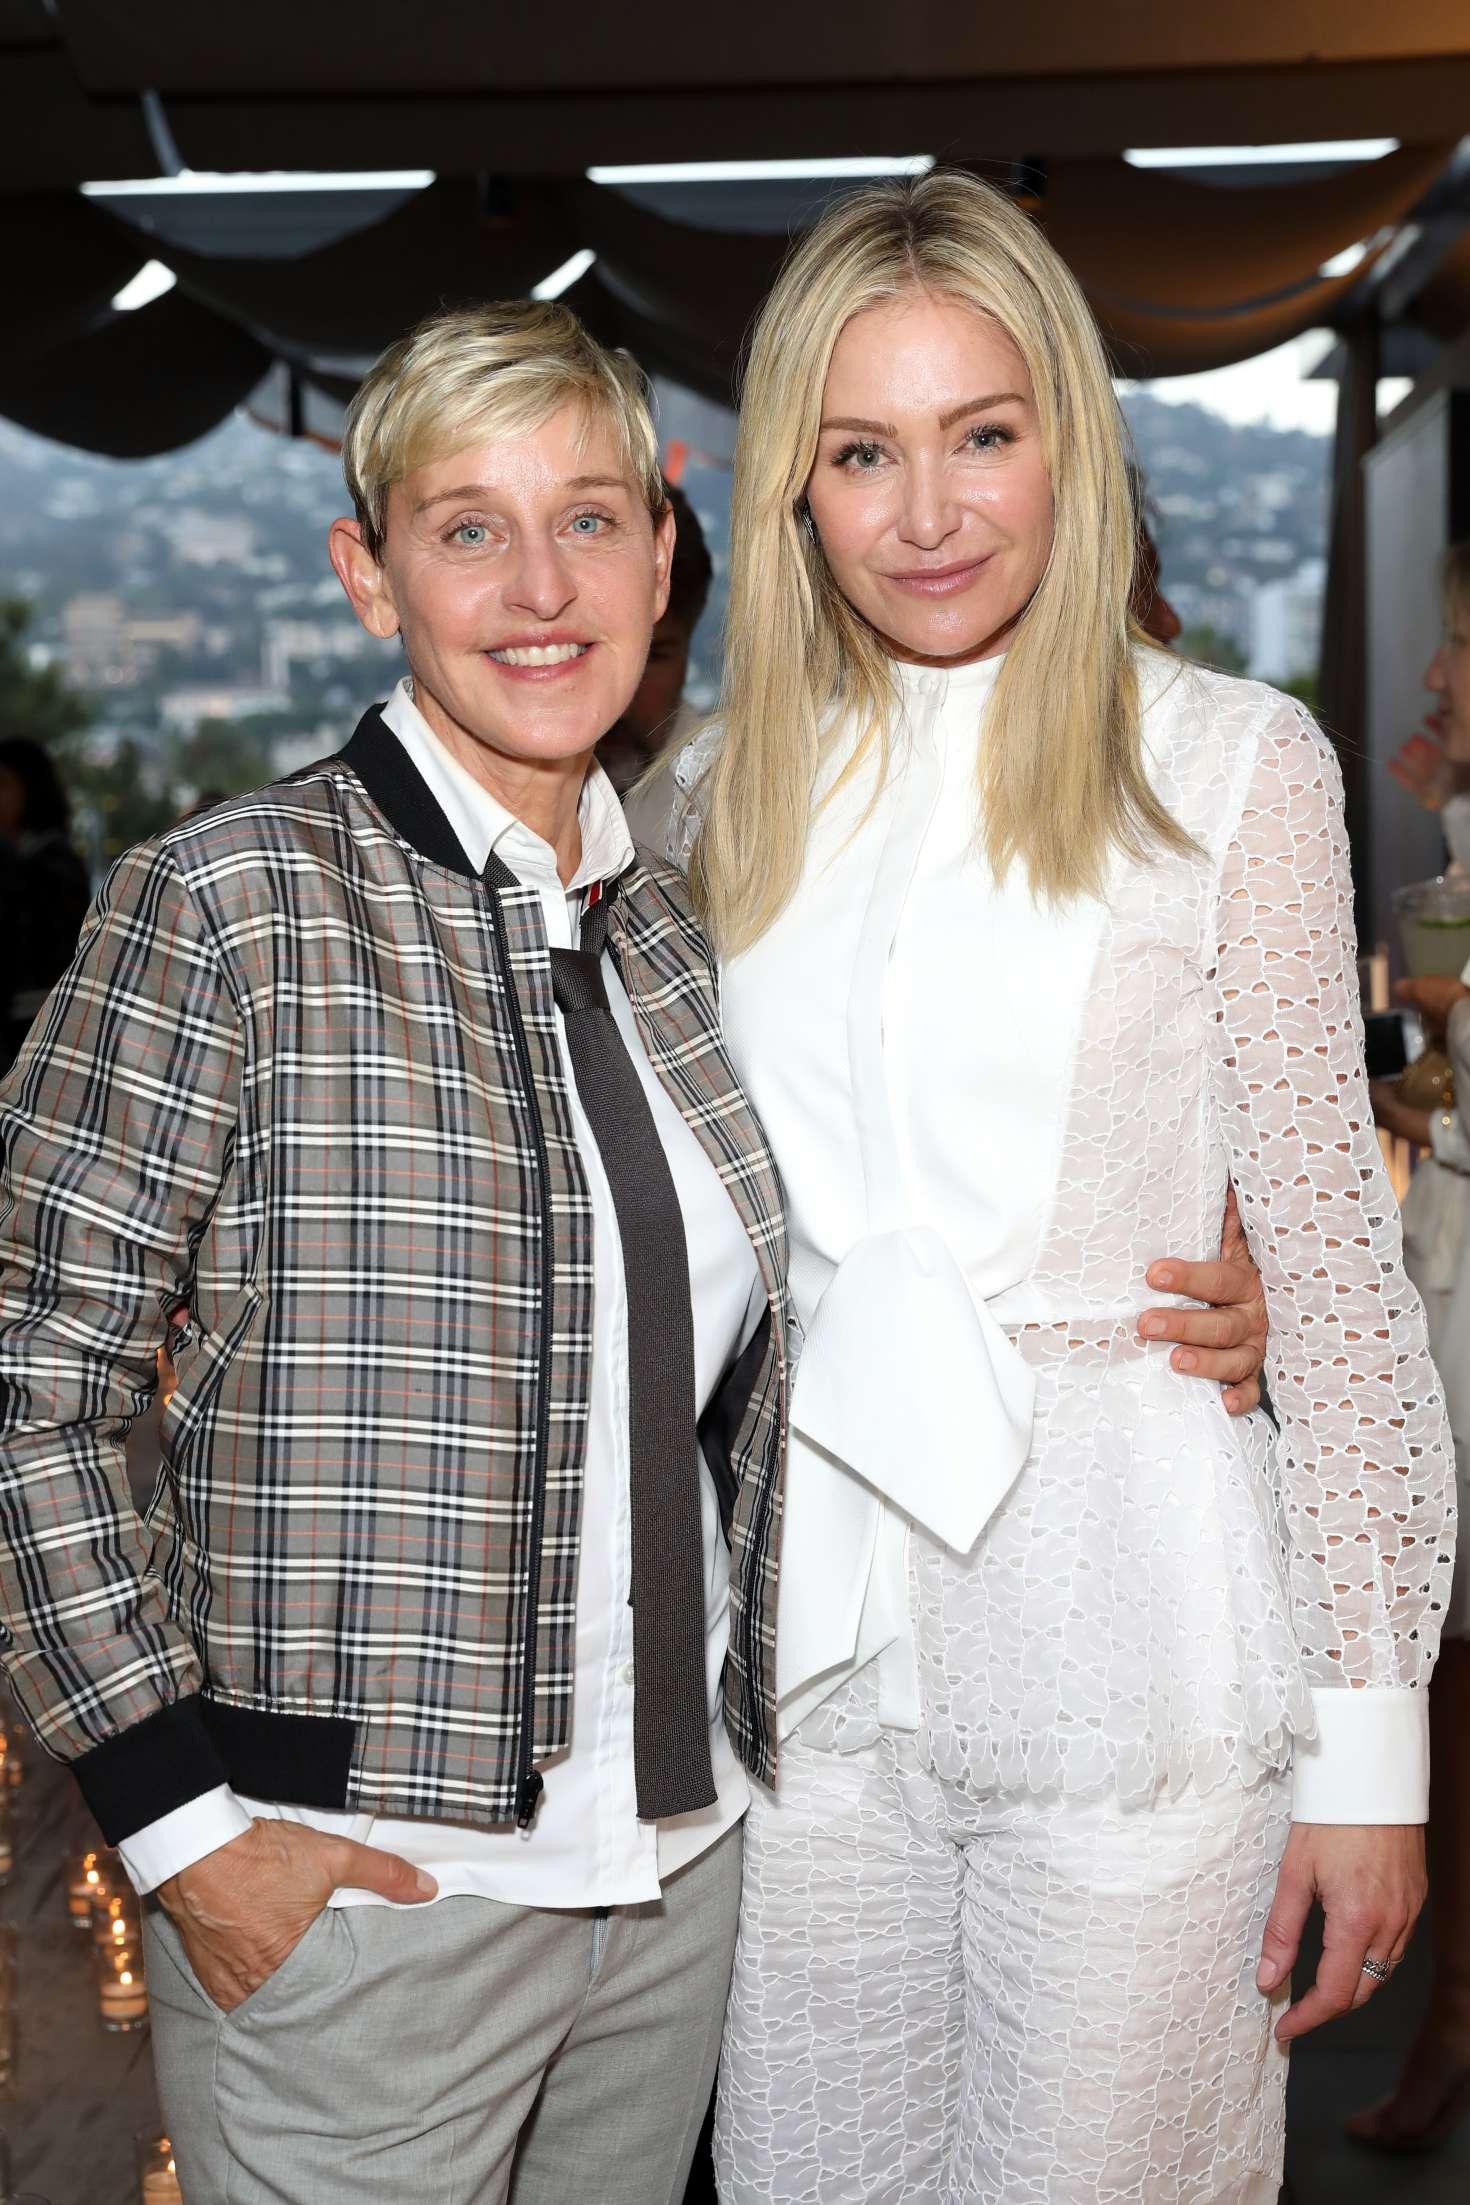 Ellen DeGeneres and Portia de Rossi - Restoration Hardware x General Public Launch in LA